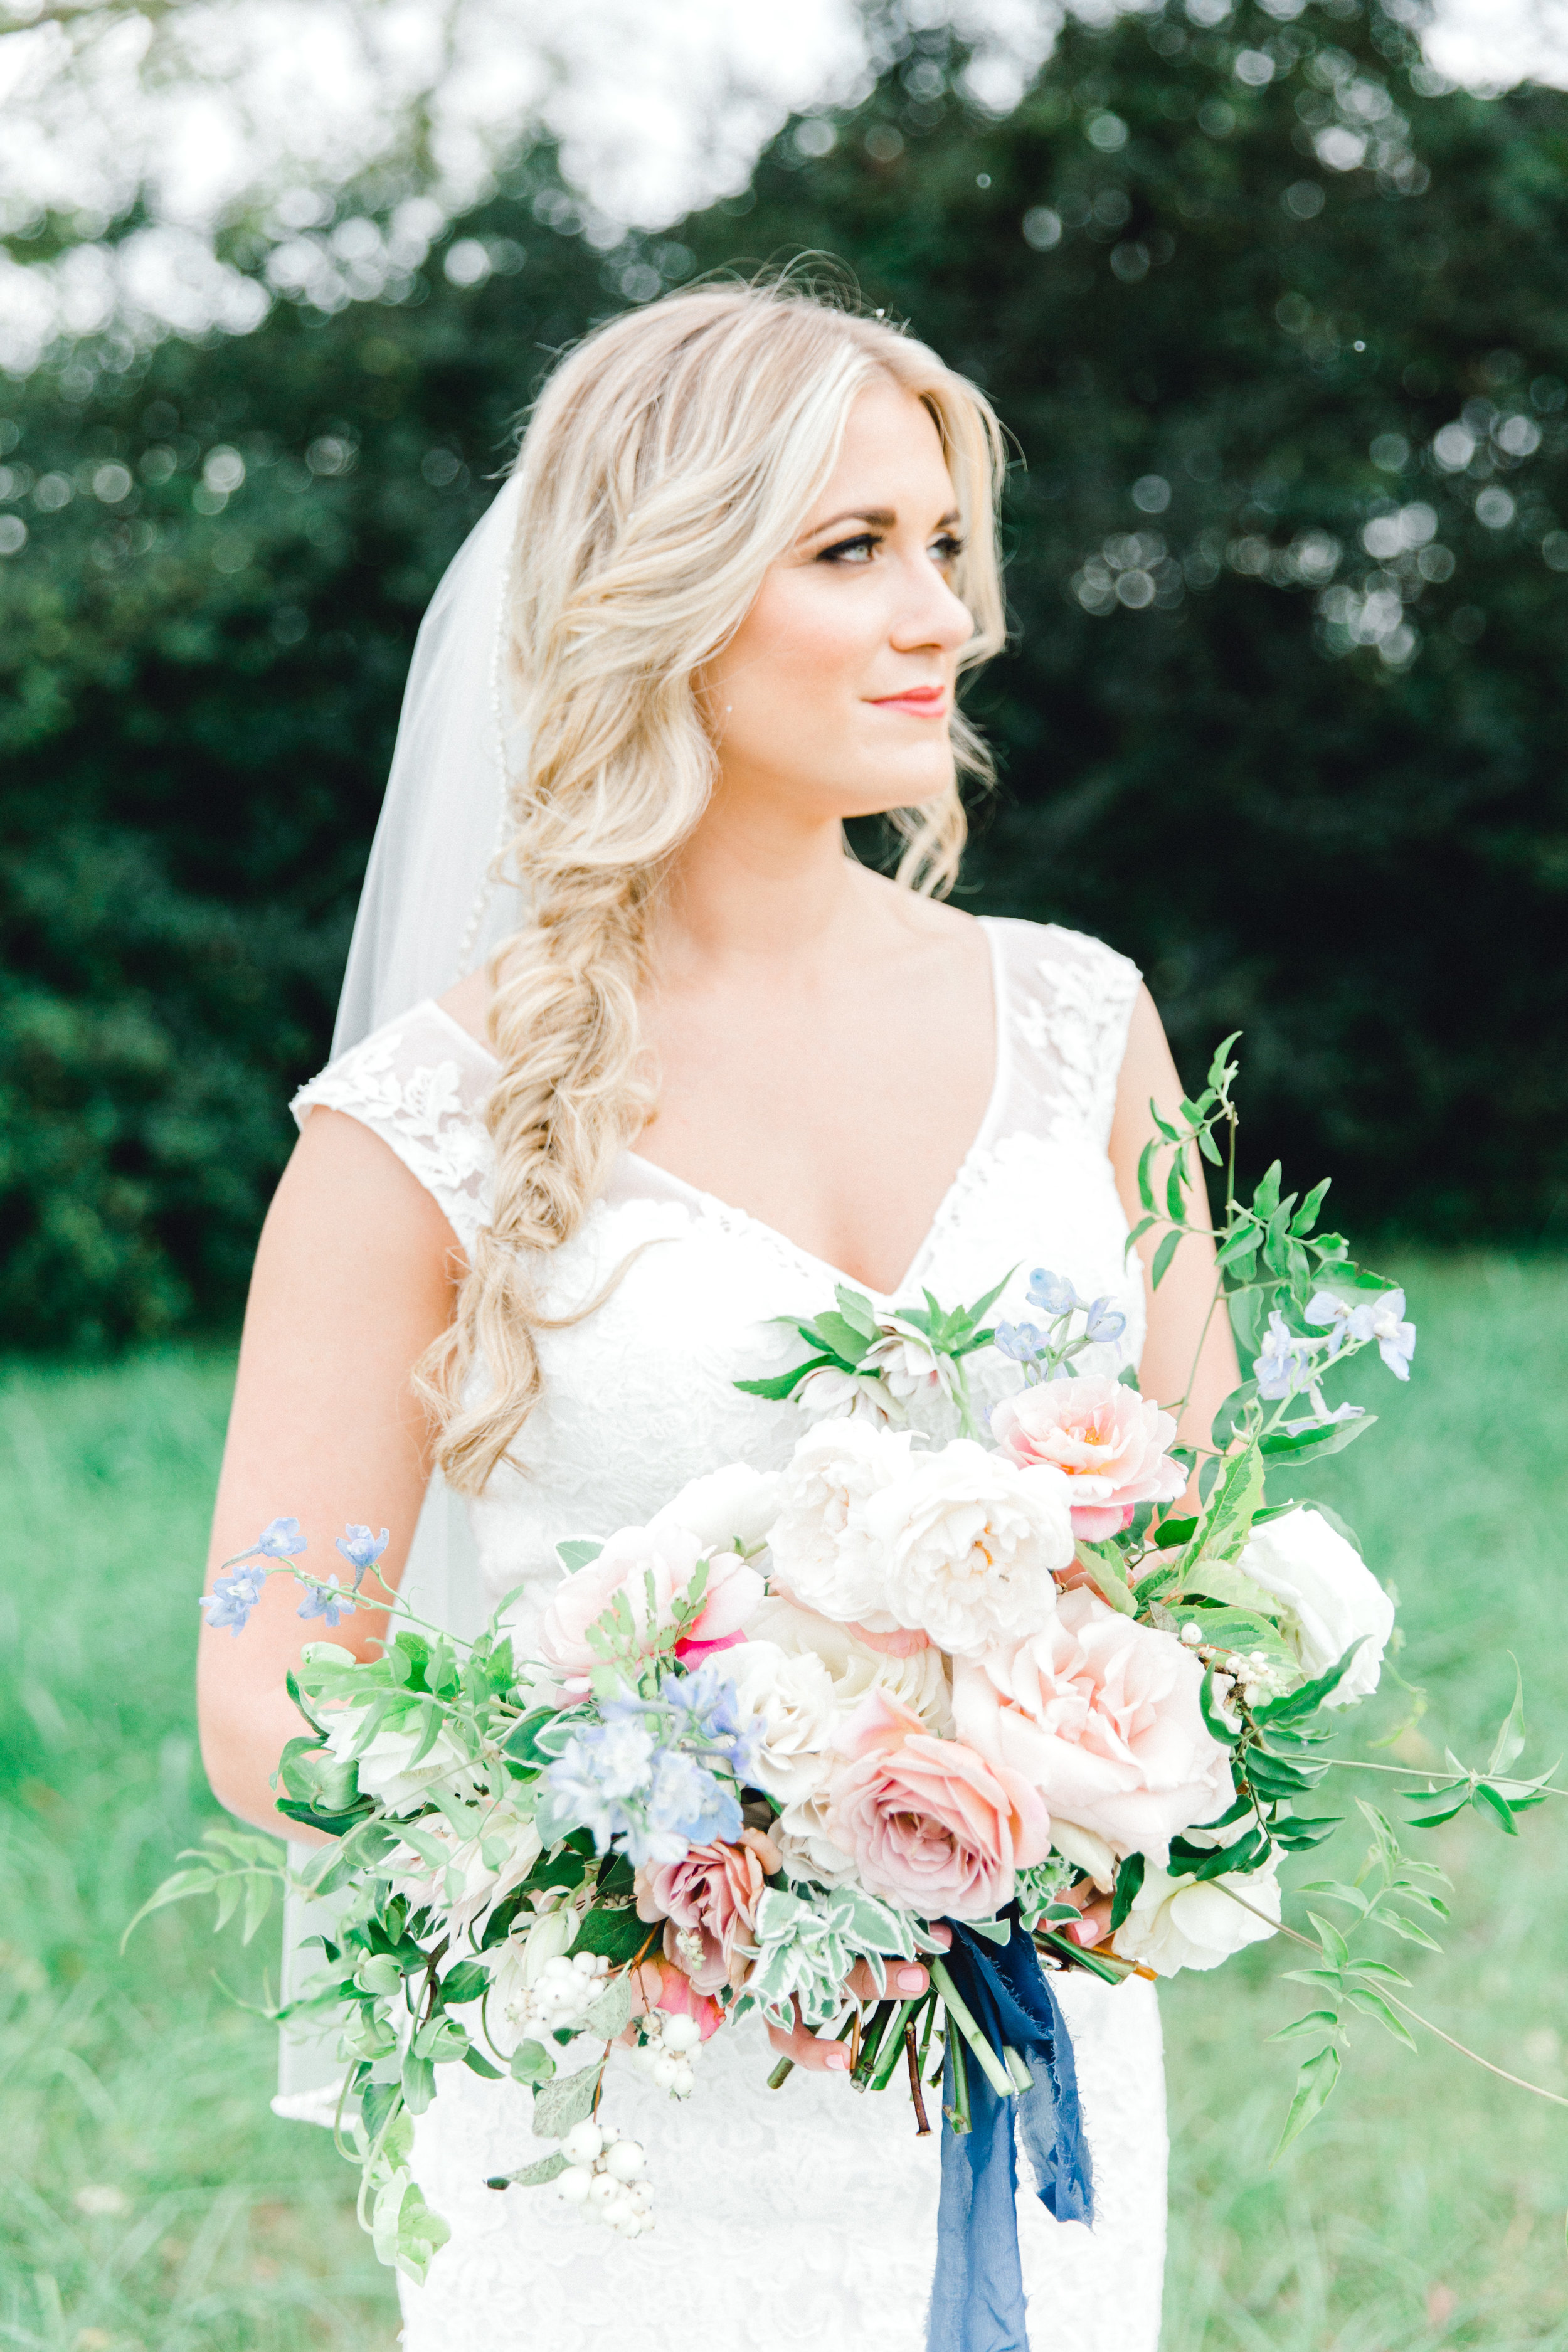 Paige-Mercer-Photography-Florida-Wedding-Photographer-Alyssa&Drew-31.jpg